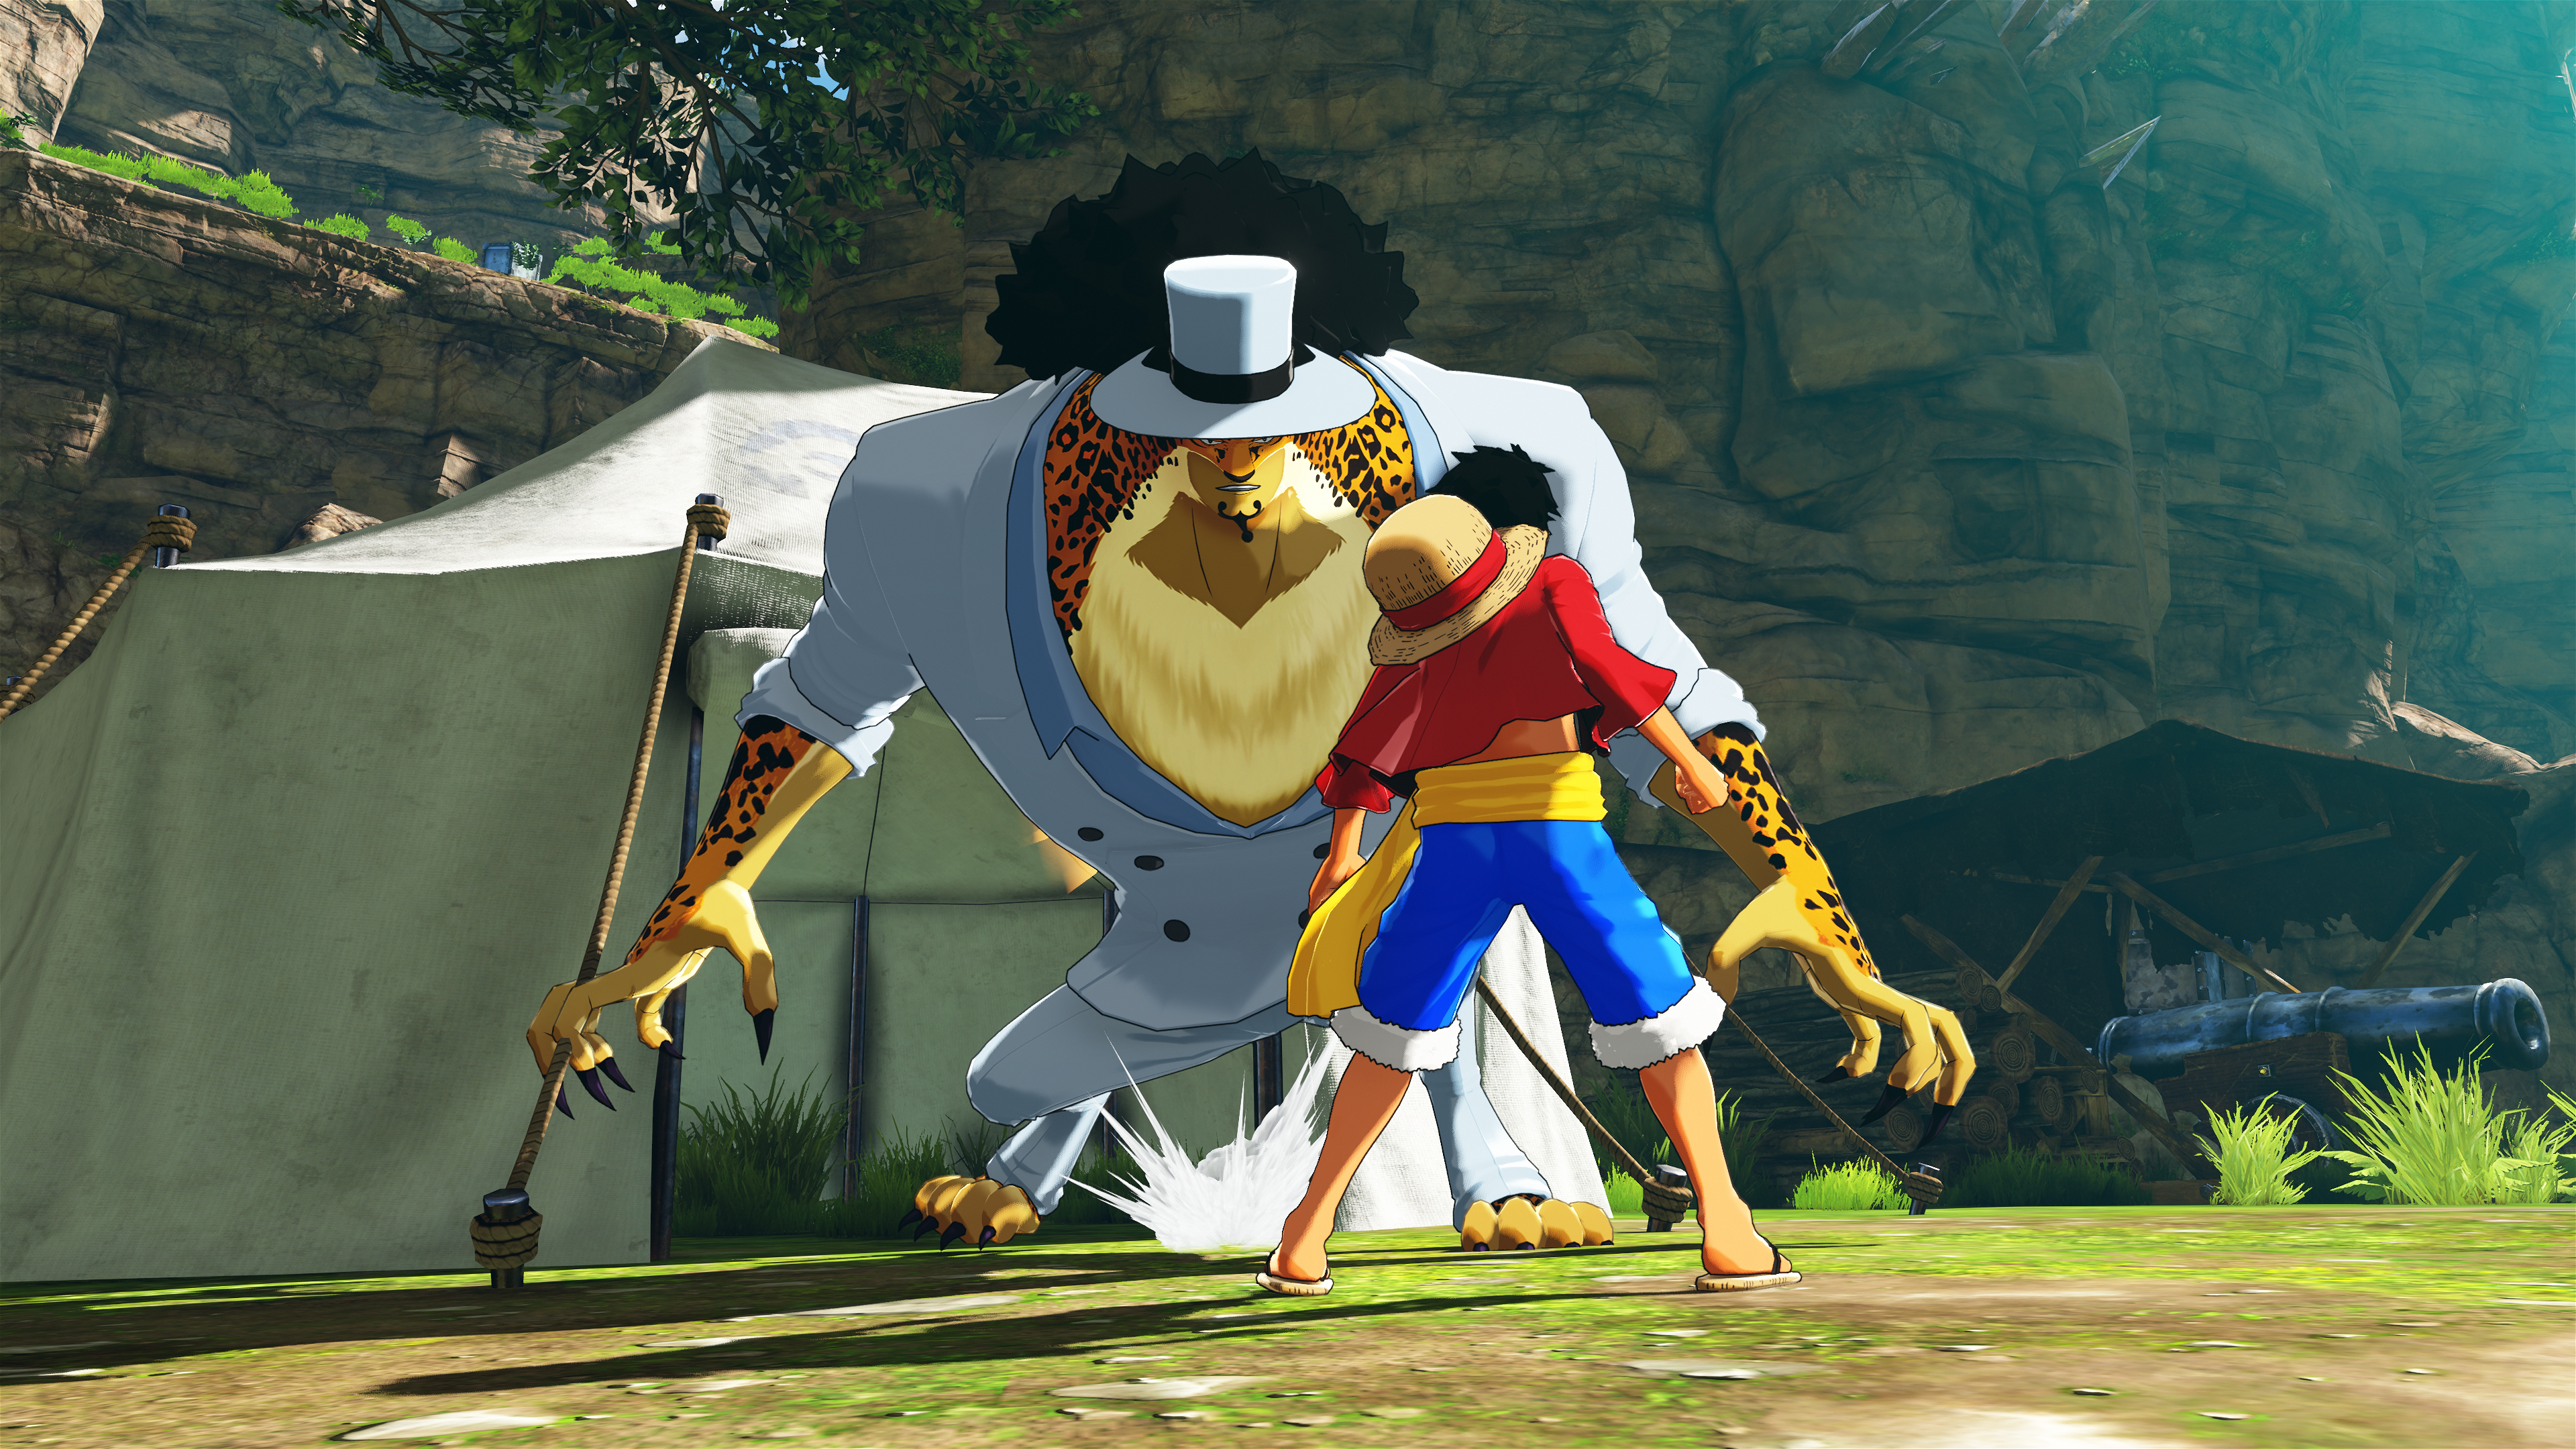 One Piece World Seeker - Luffy vs Lucci